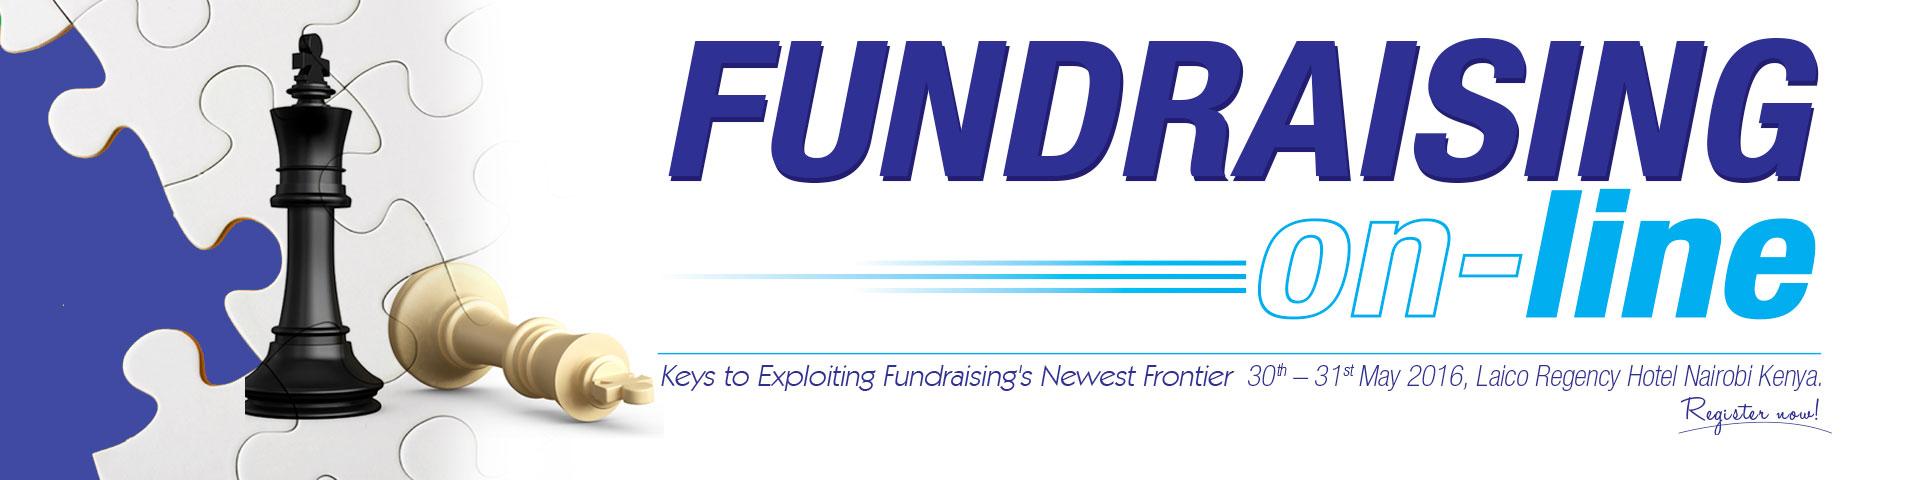 Fundraising-Online-5